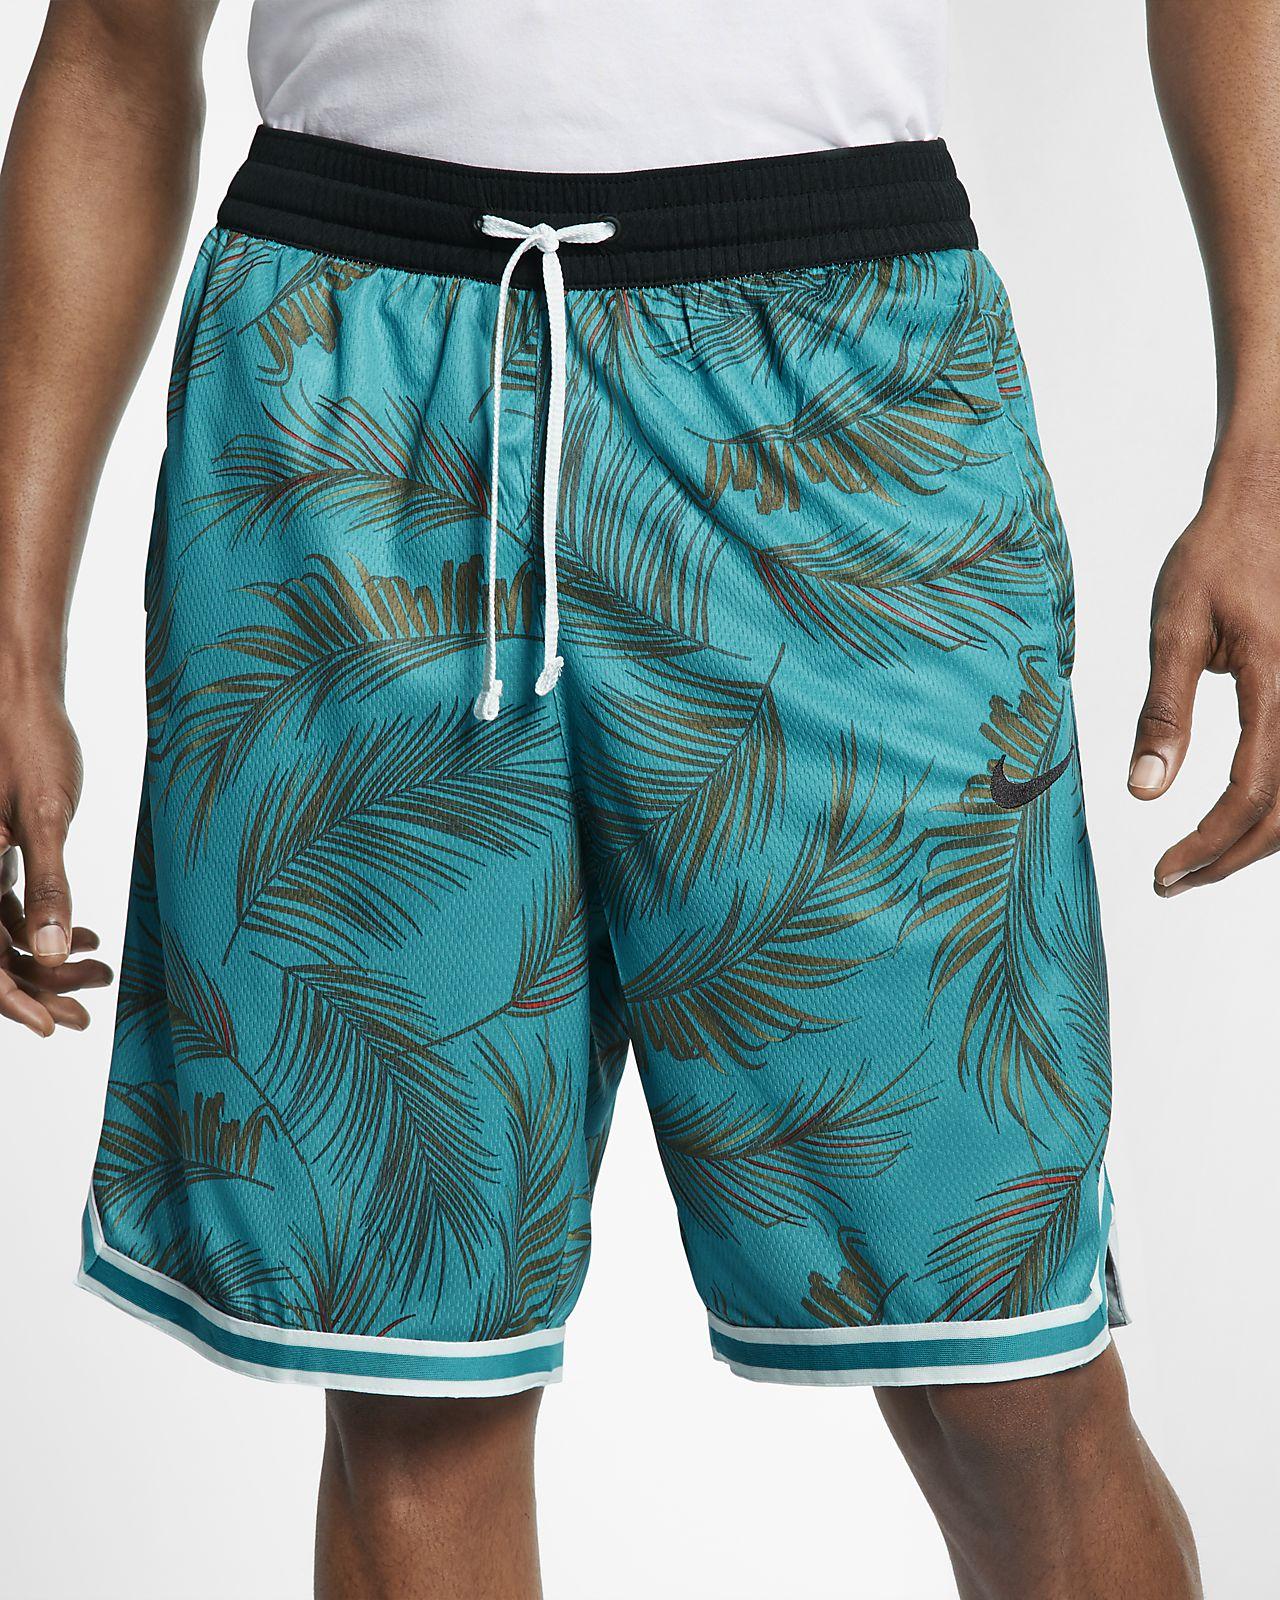 9768d7b4c5ae6 Nike Dri-FIT DNA Basketball Shorts - SPORTING GOODS Basketball Shorts |  Athletic Shorts - Superfanas.lt